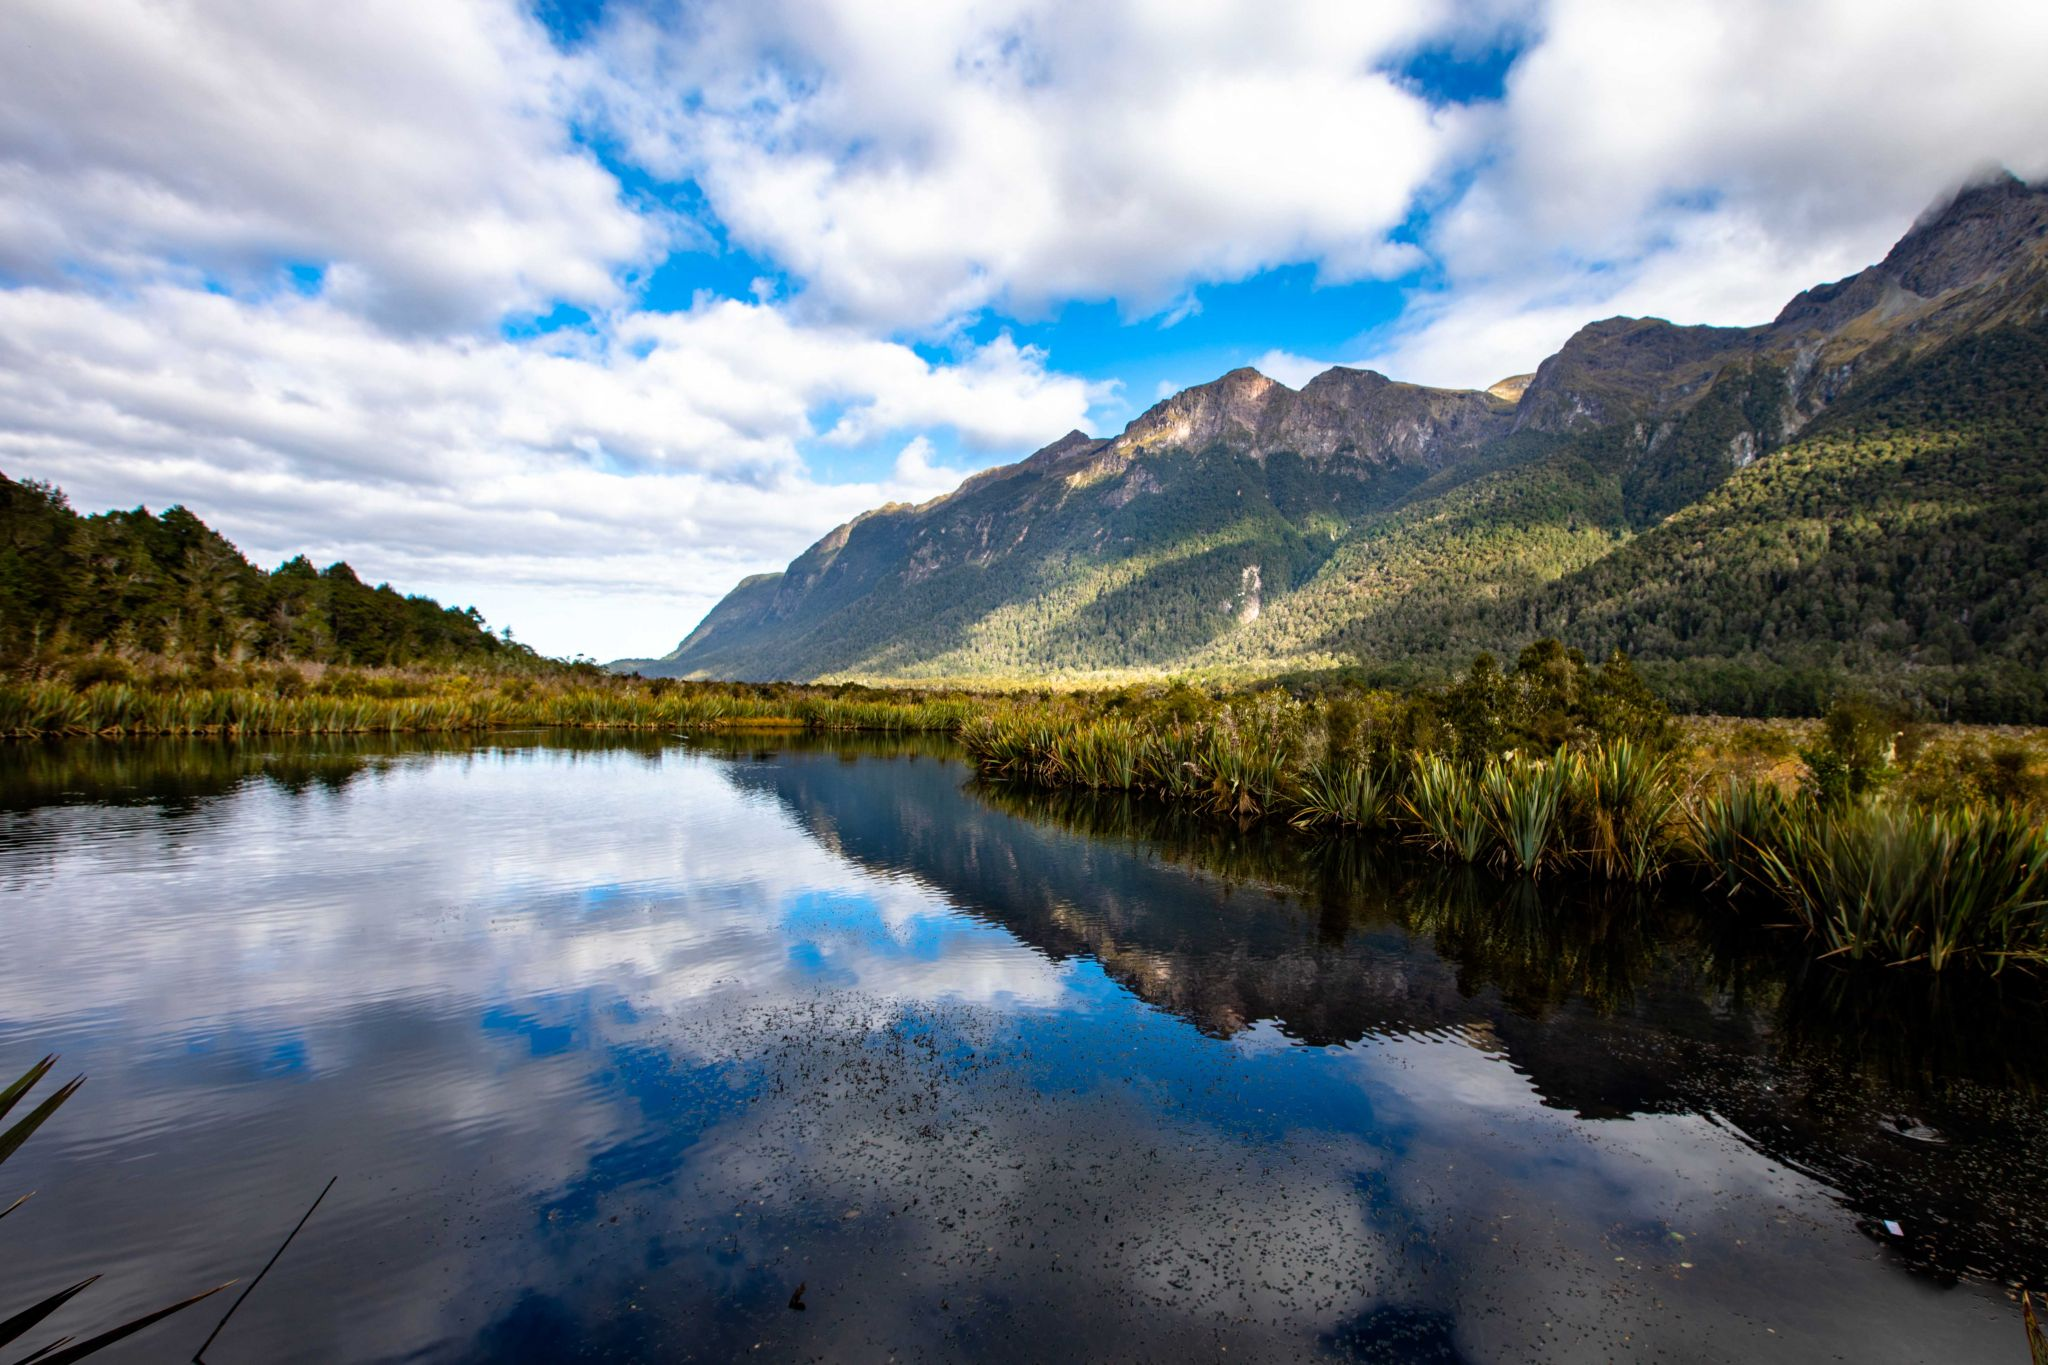 Mirror Lake, Fiordland National Park South Island, New Zealand